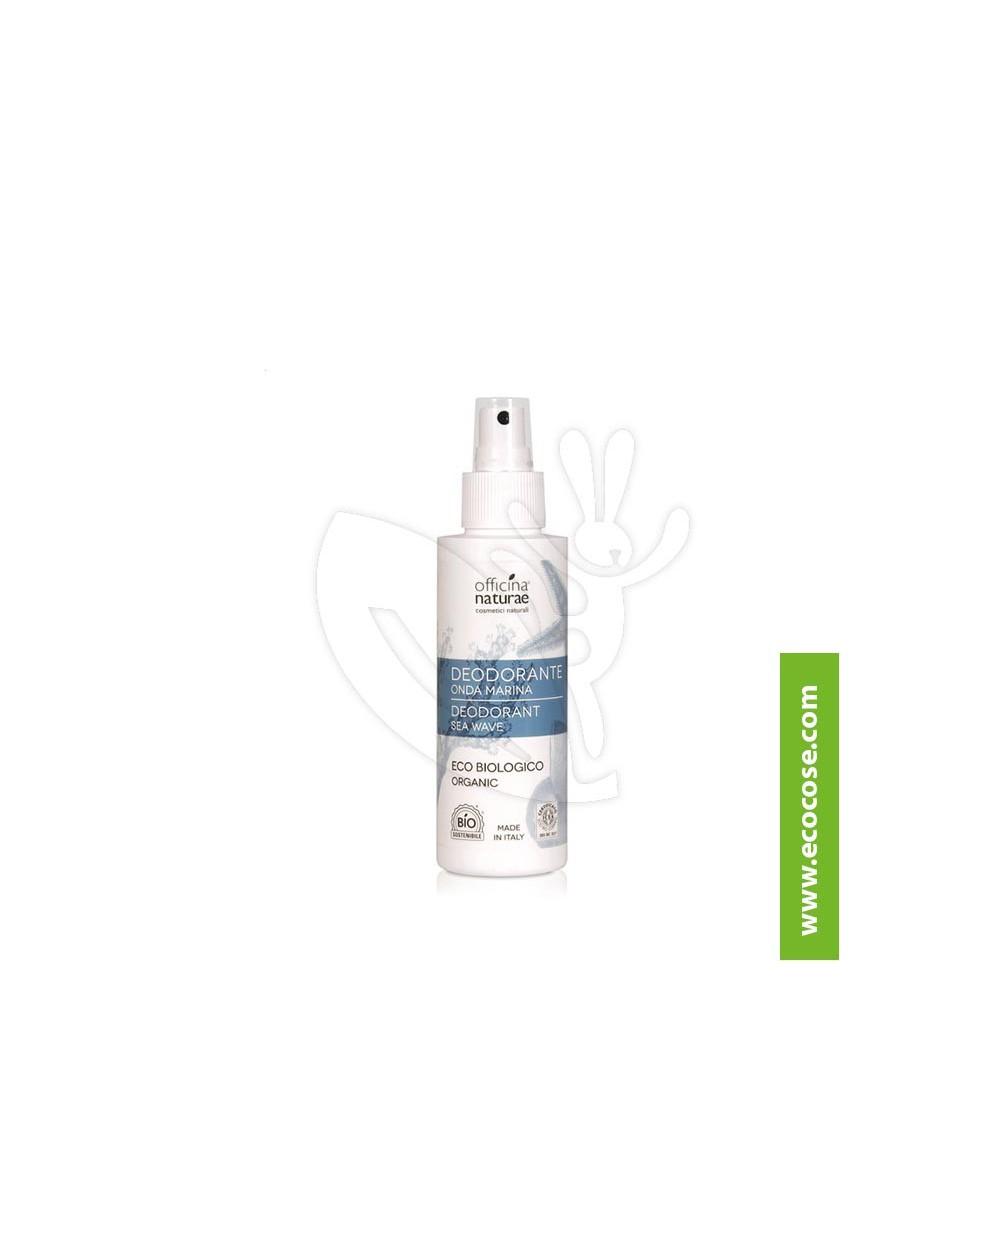 Officina Naturae - Gli Innovattivi - Deodorante SPRAY Onda Marina